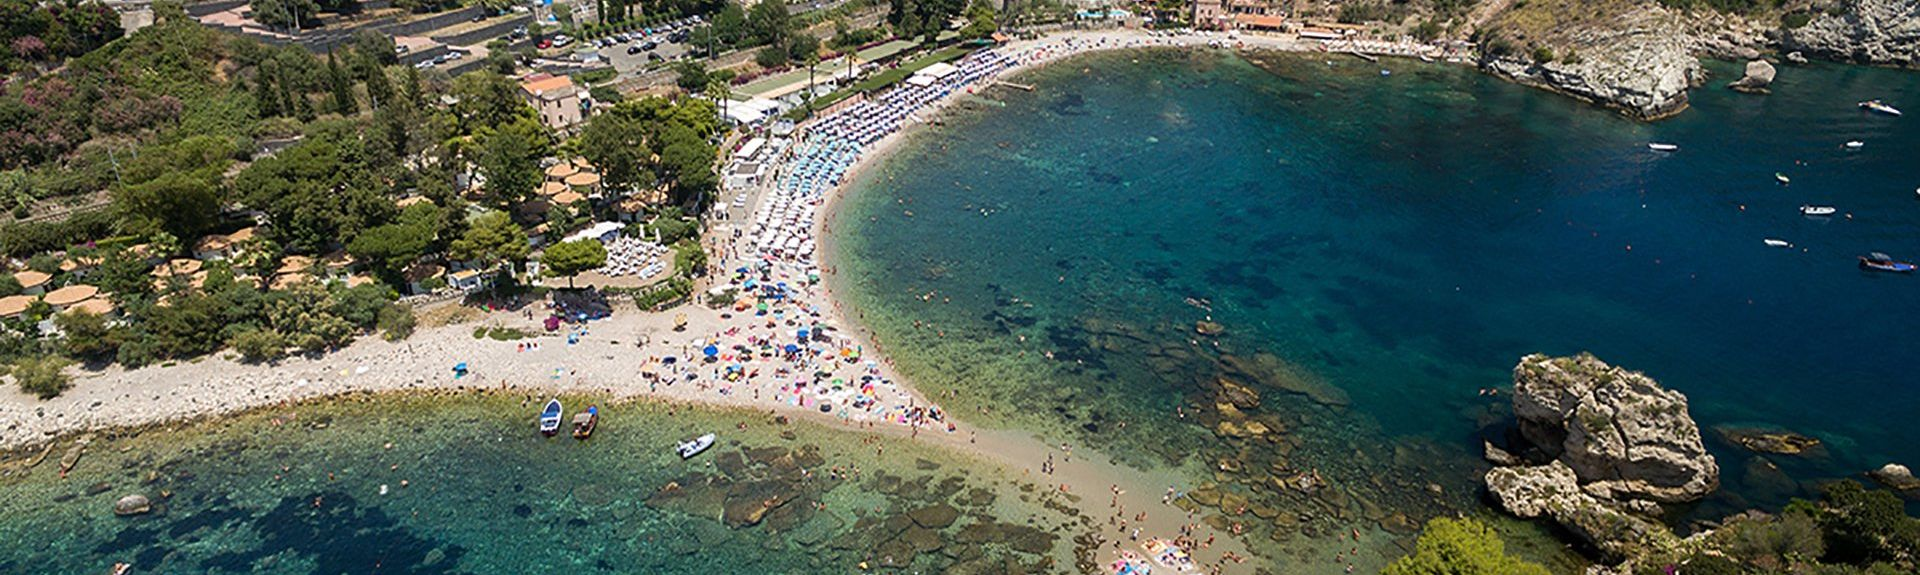 Linguaglossa, Sicília, Itália